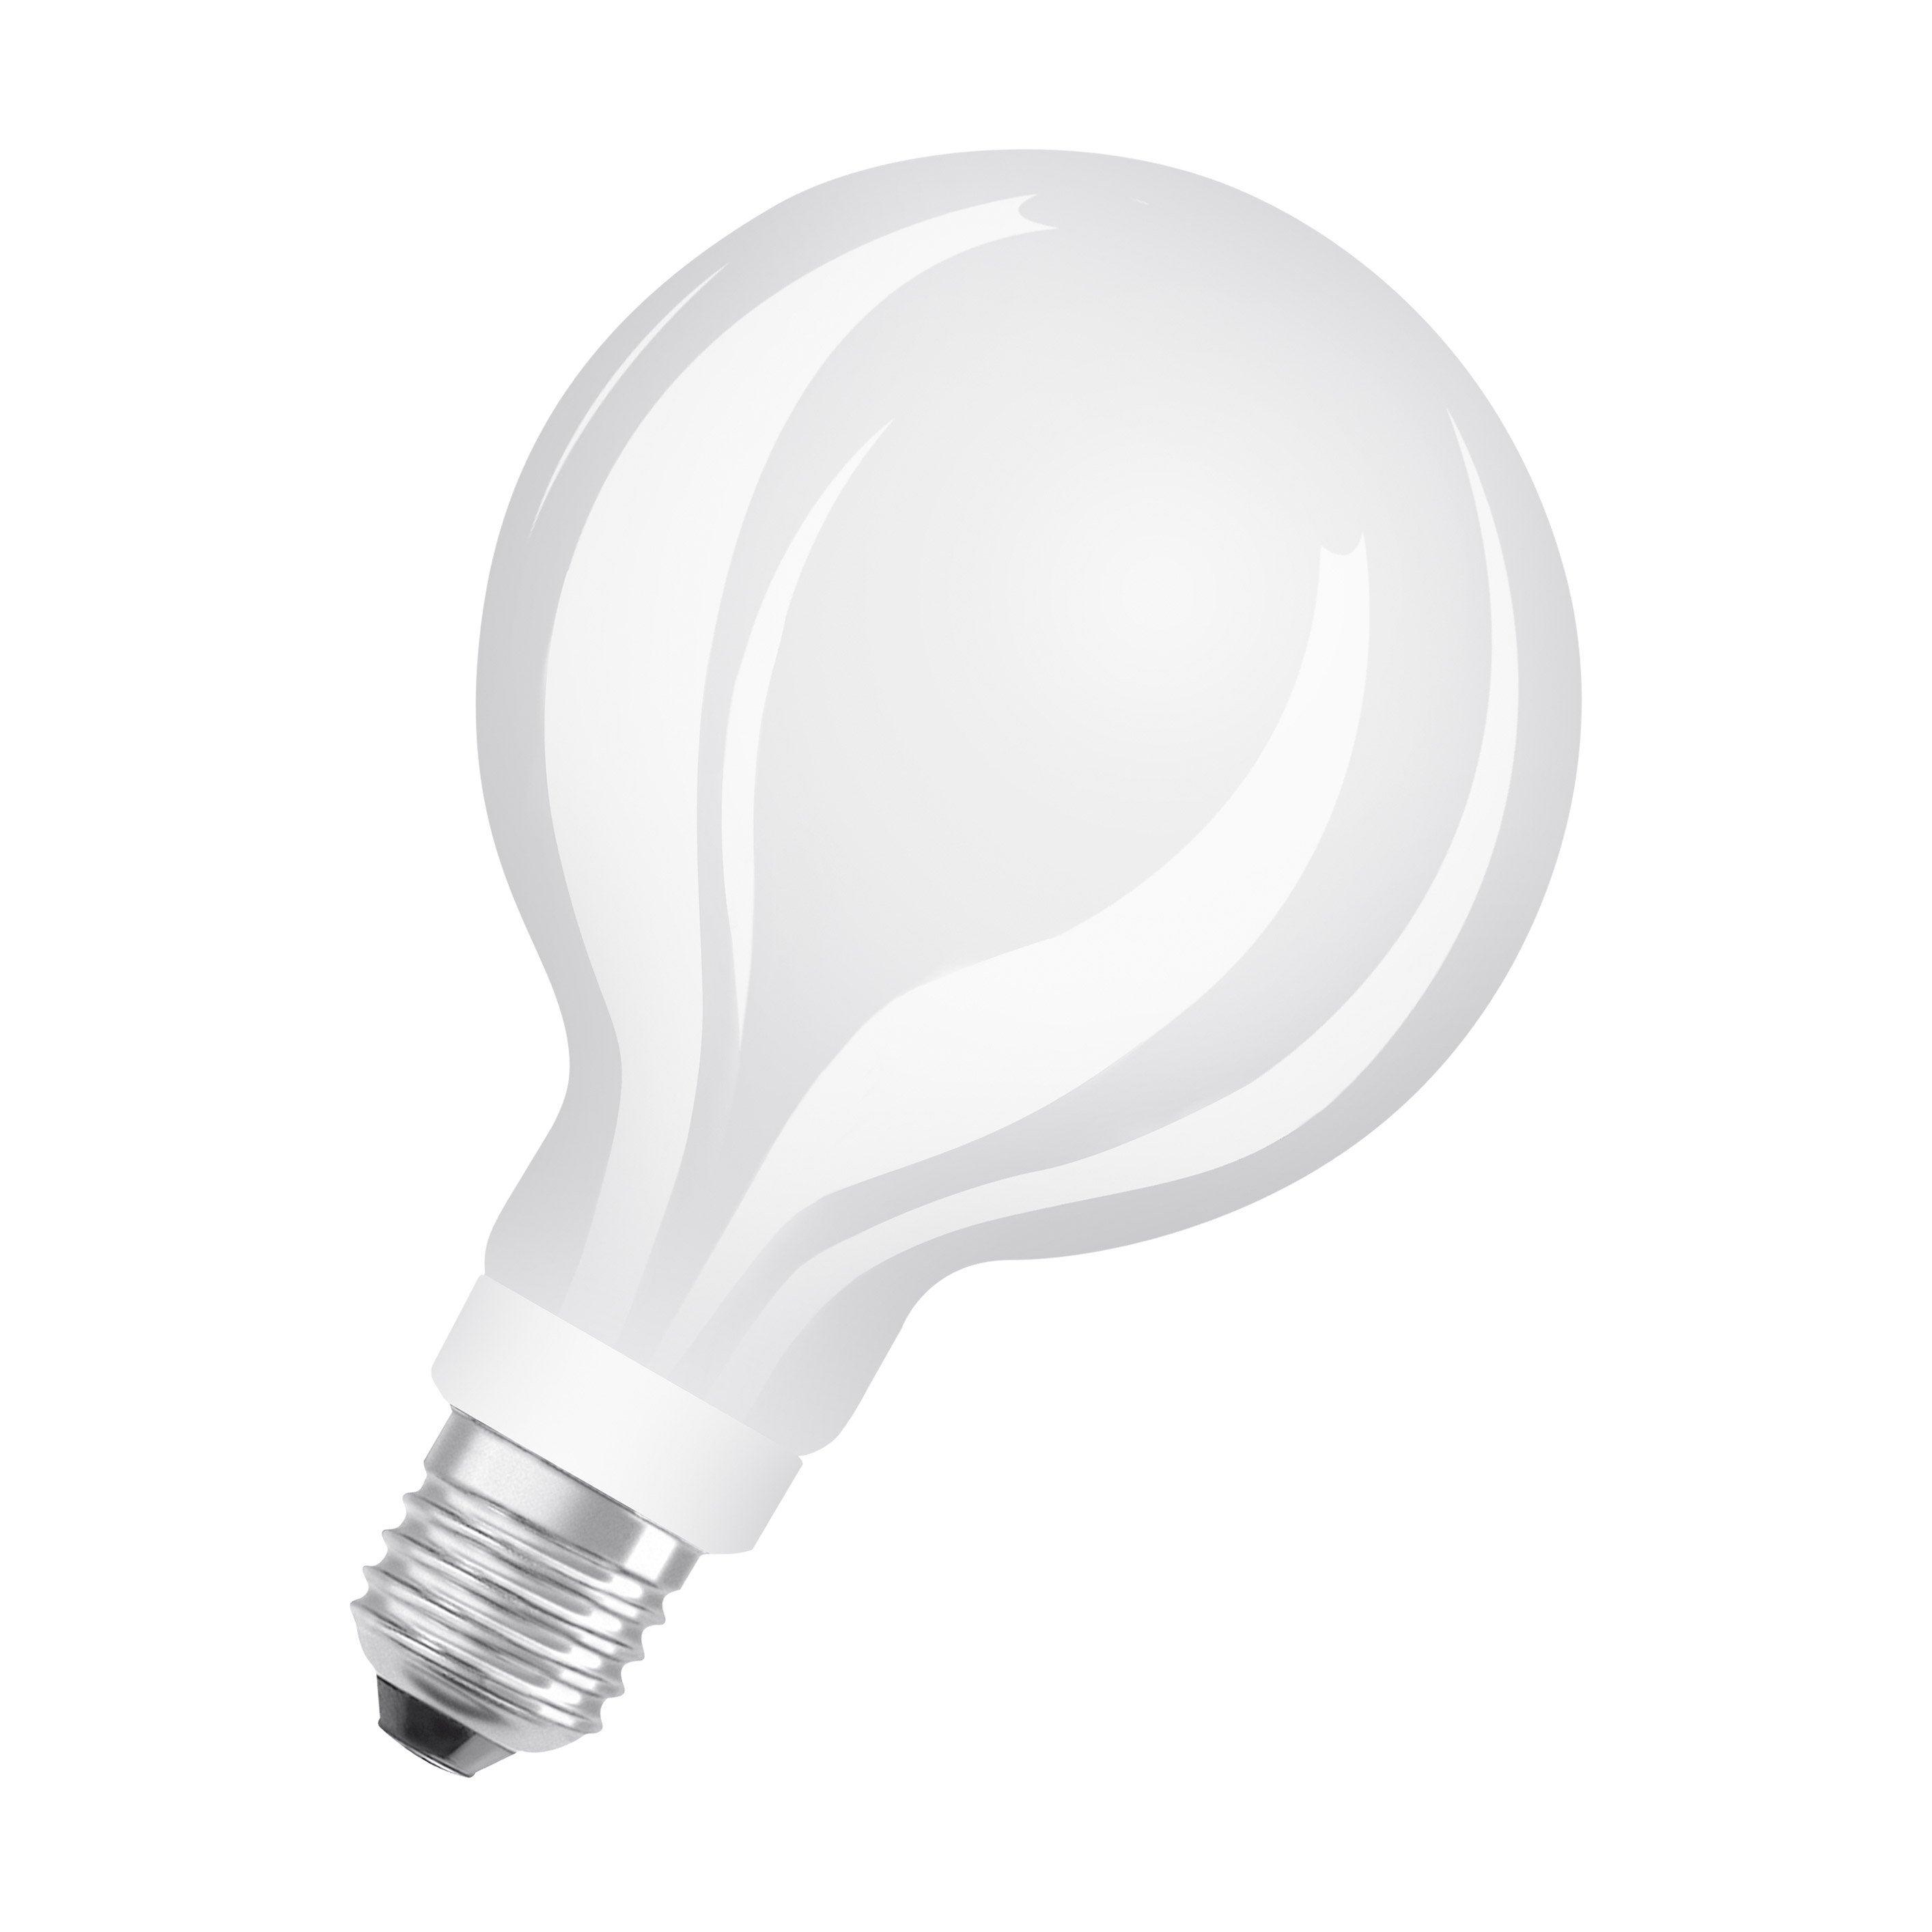 PrixLeroy Lumens 100 Merlin Meilleur Au Ampoule CBrdoWex